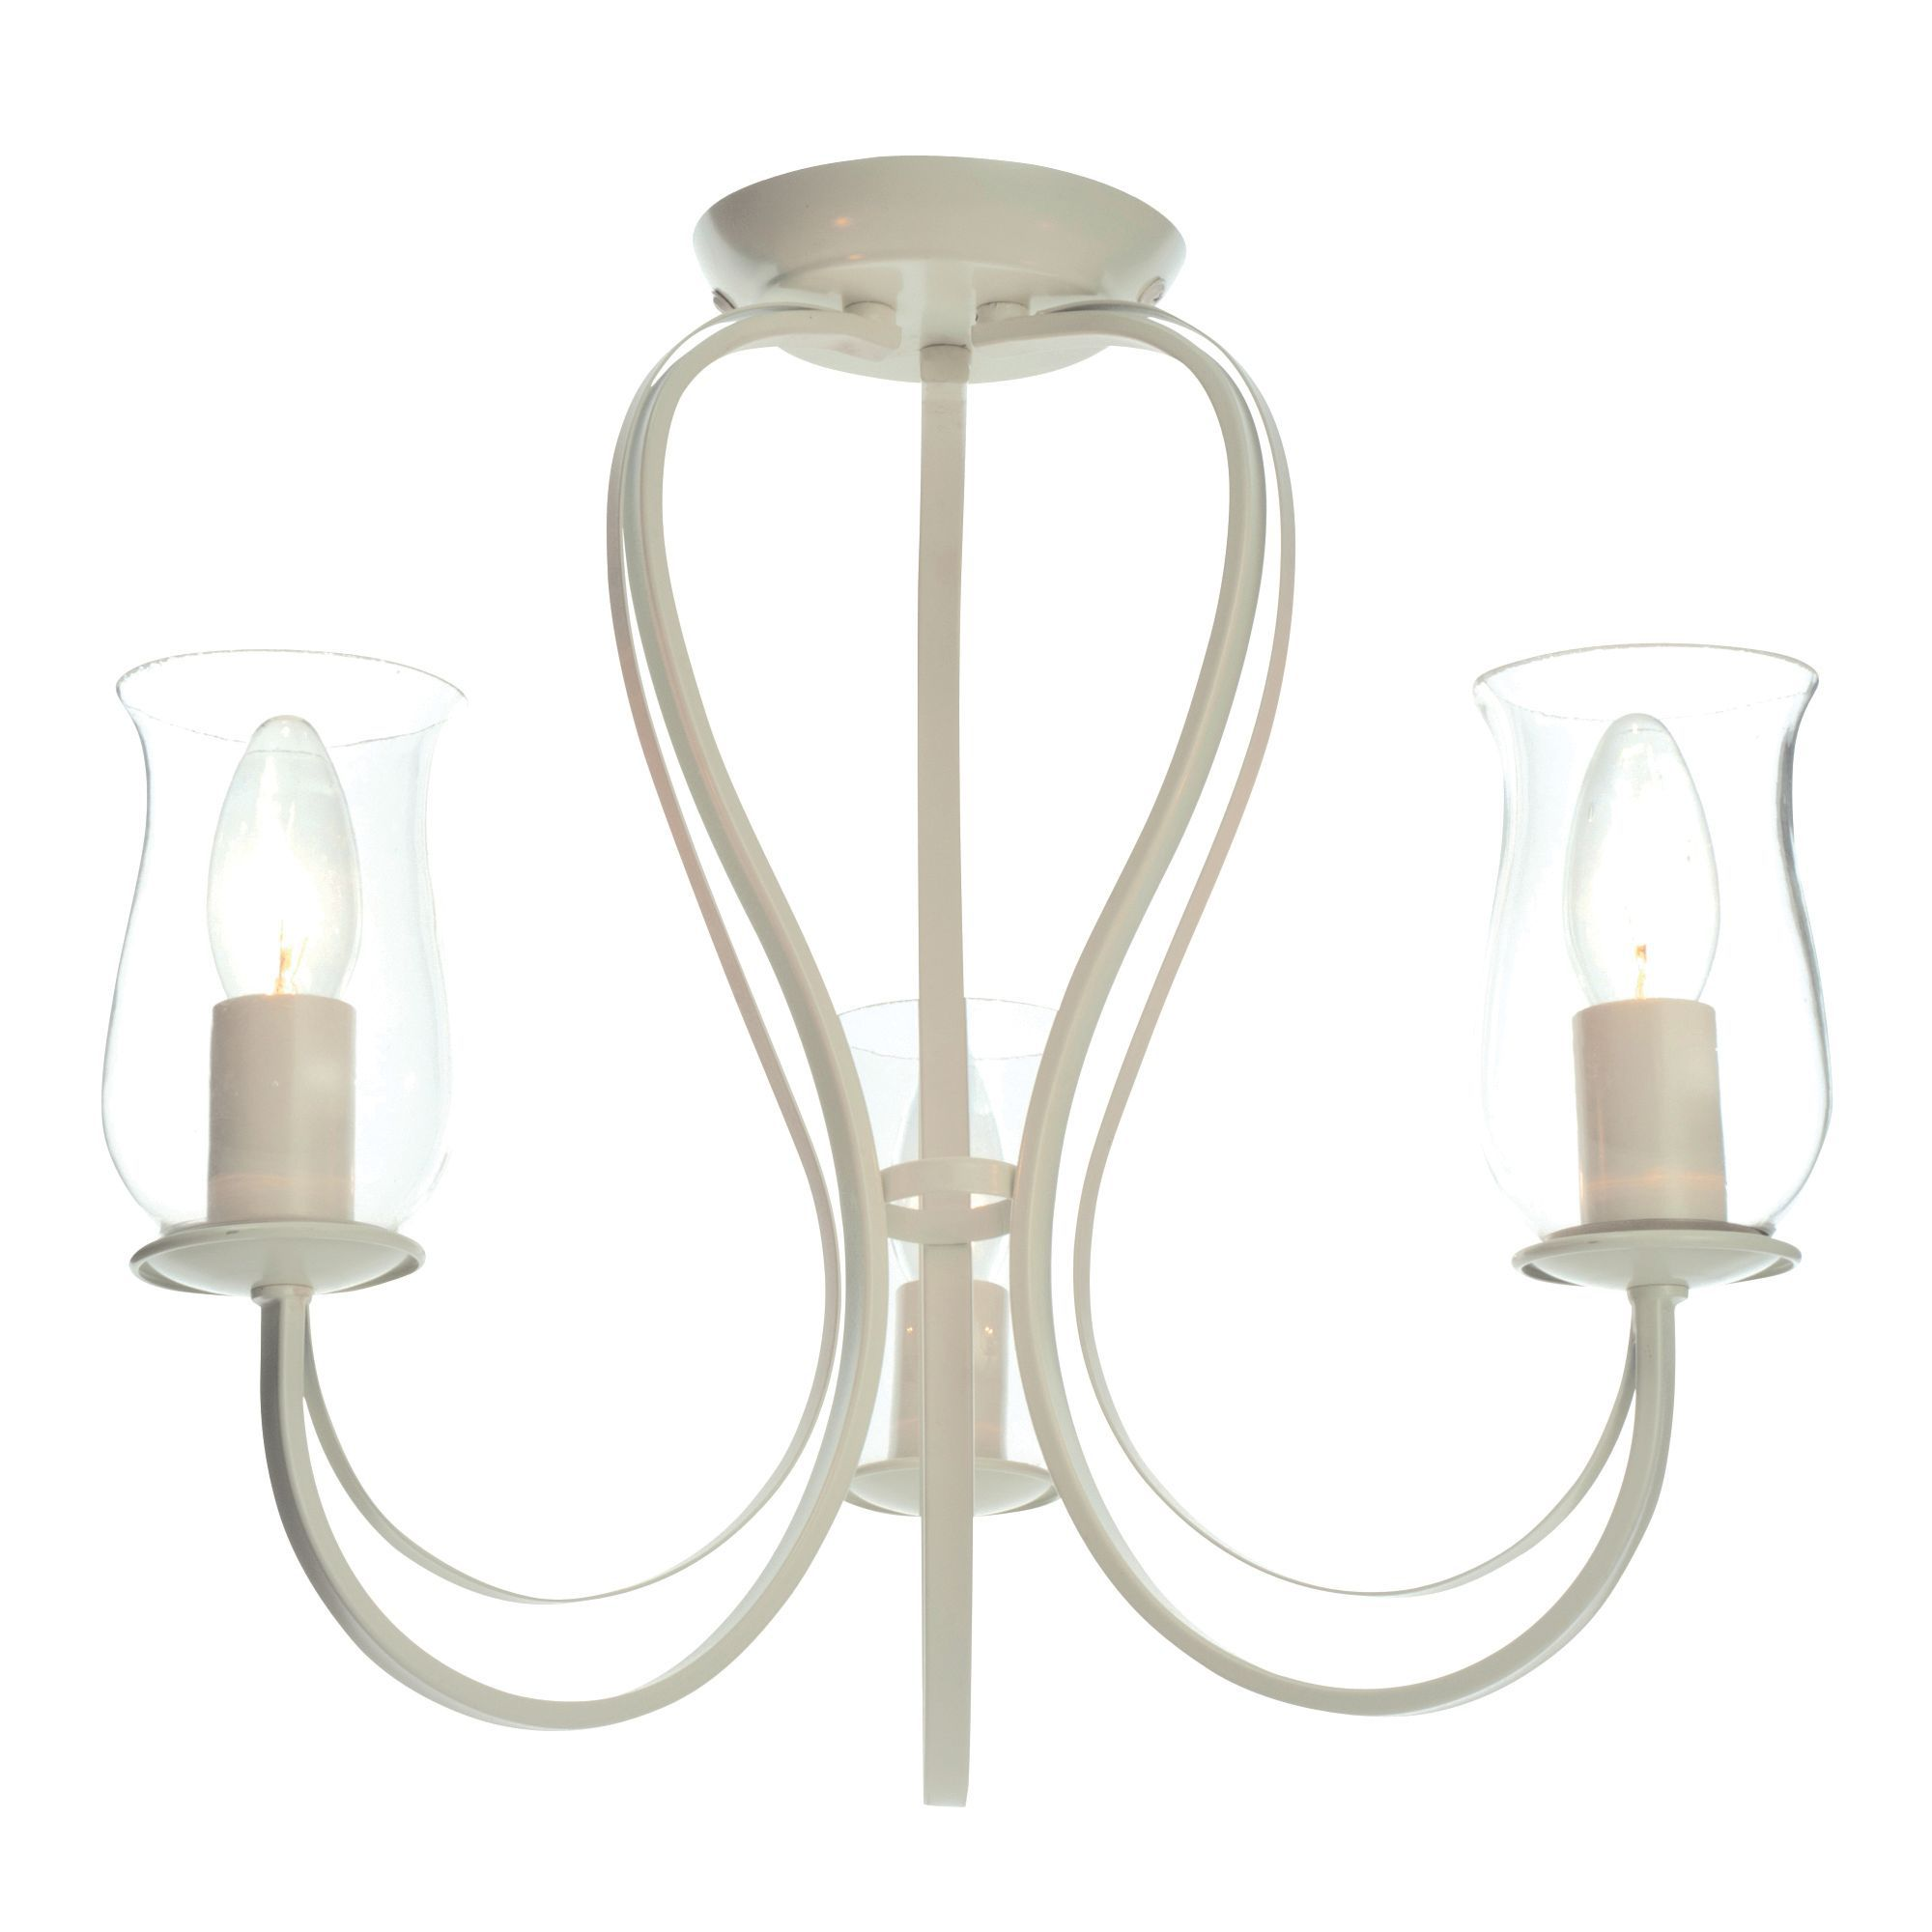 Chateau Cream Porcelain Effect 3 Lamp Ceiling Light | Departments ...